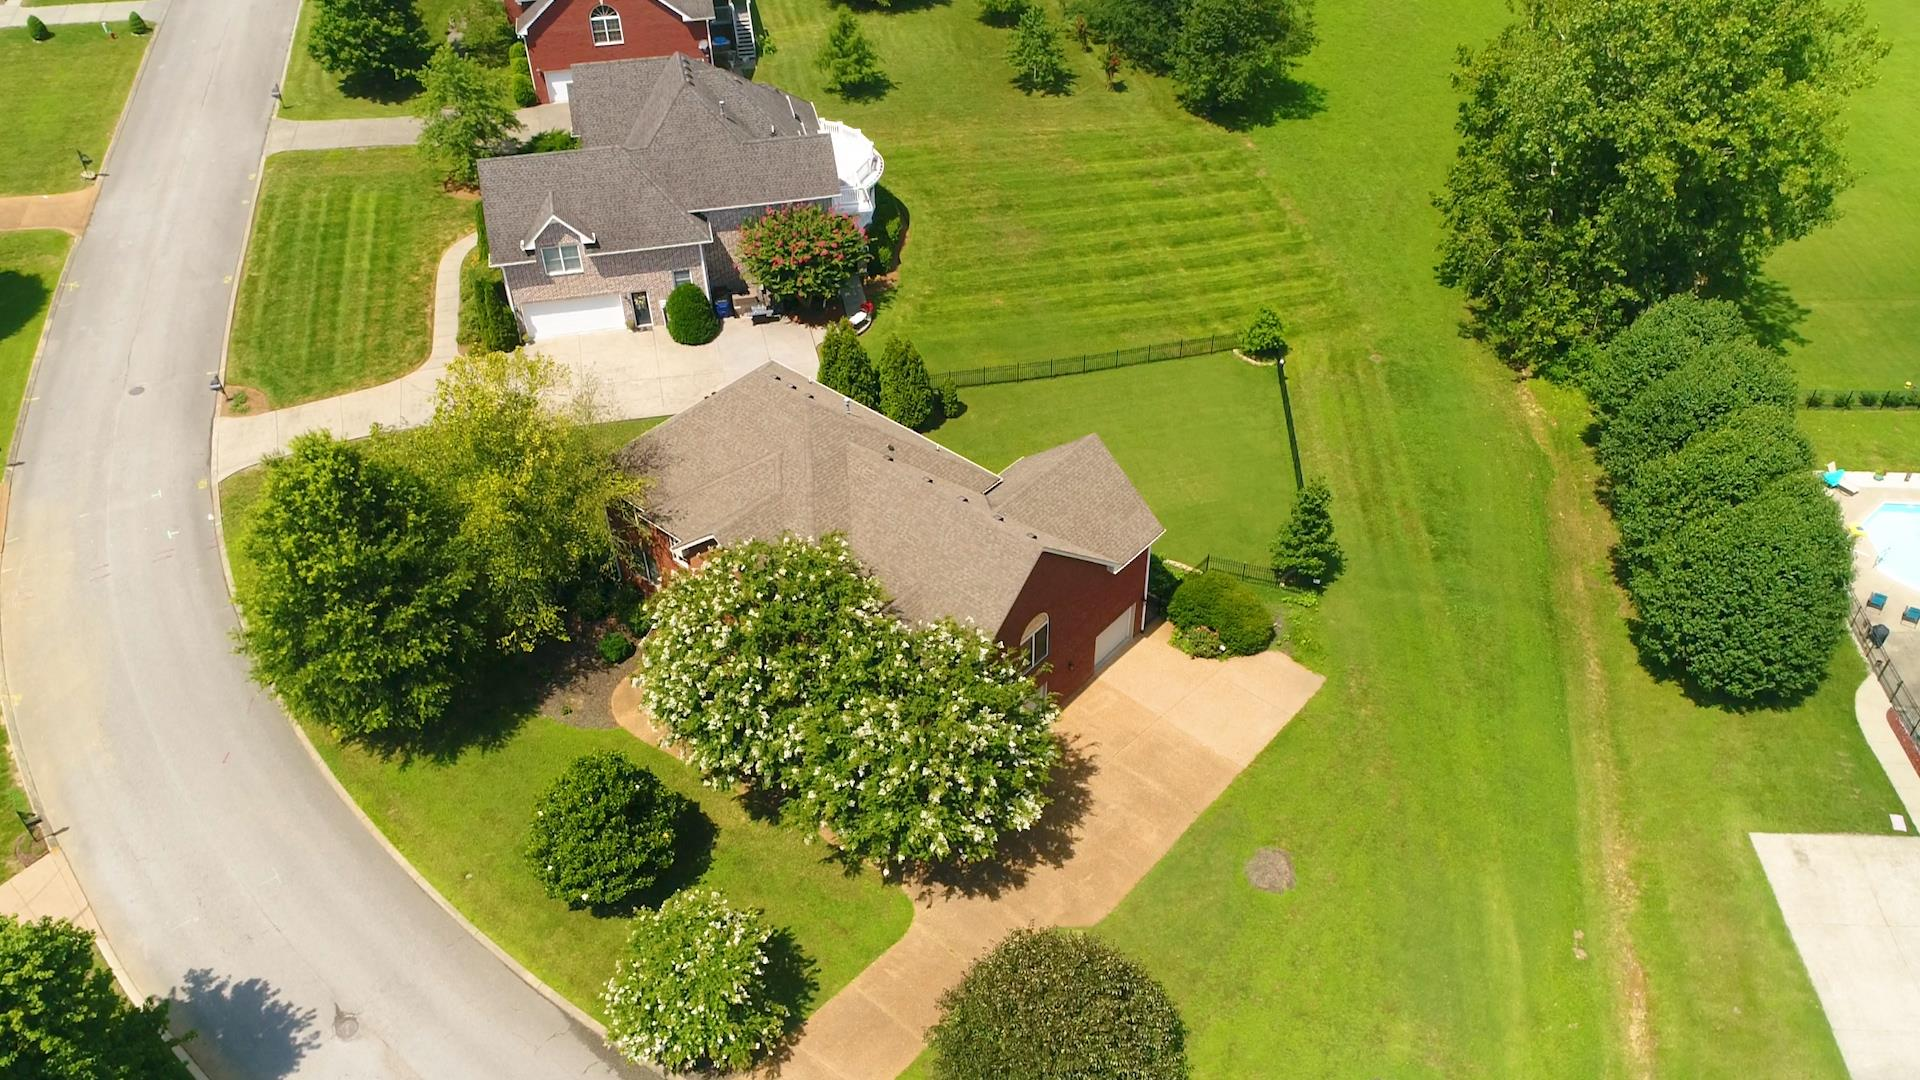 145 N Wynridge Way, Goodlettsville, TN 37072 - Goodlettsville, TN real estate listing